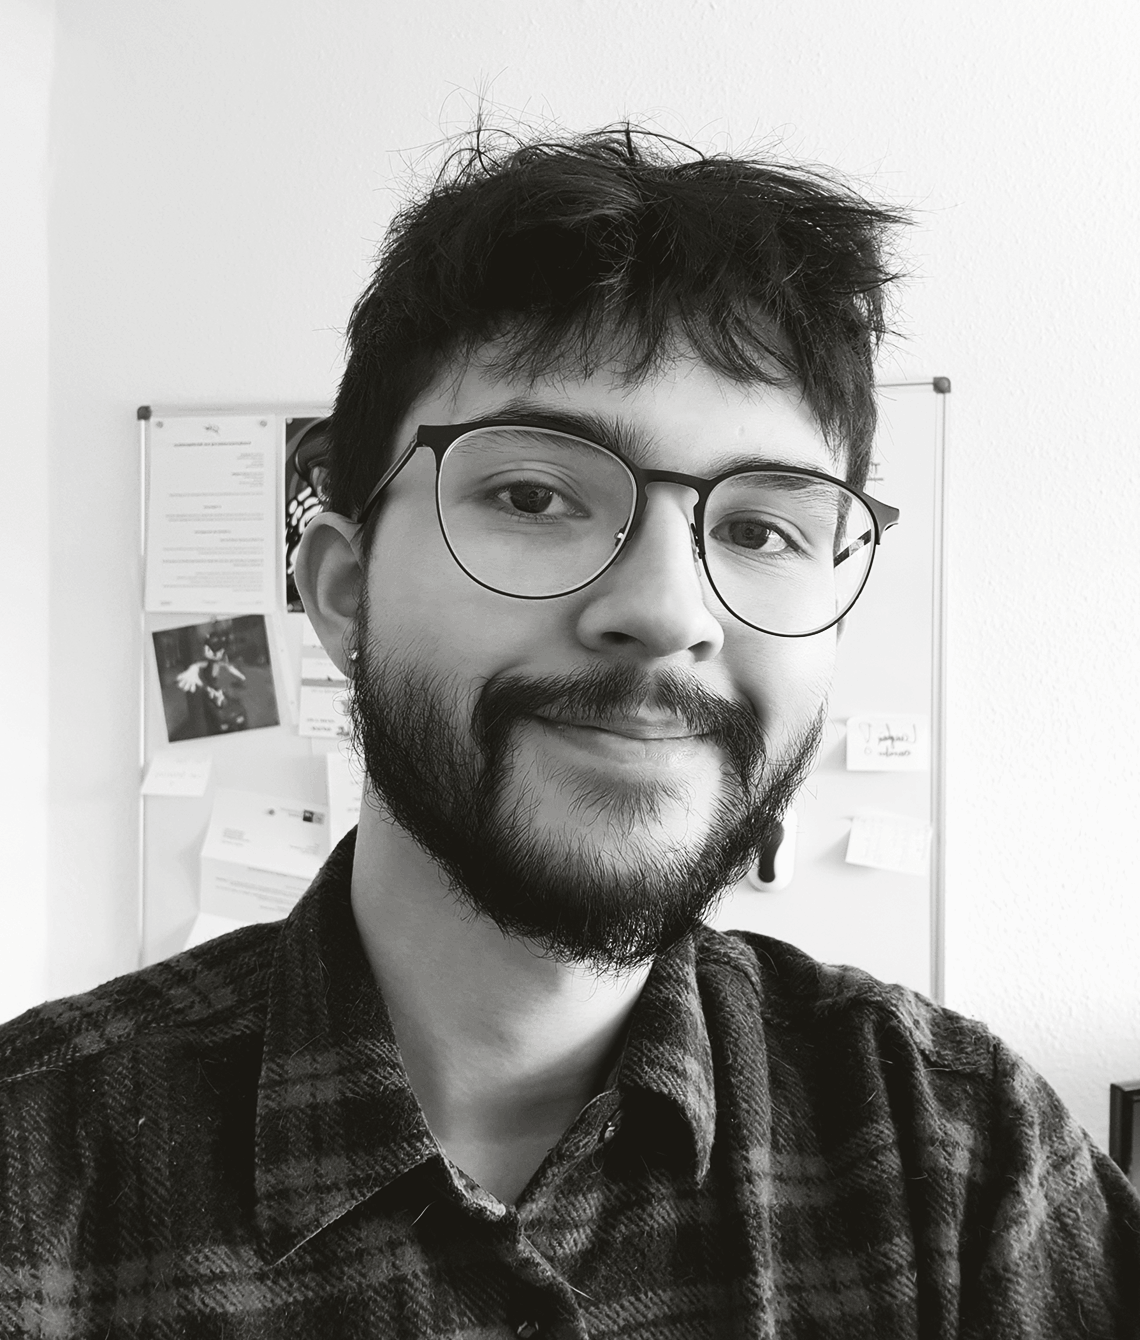 Profile Picture of me